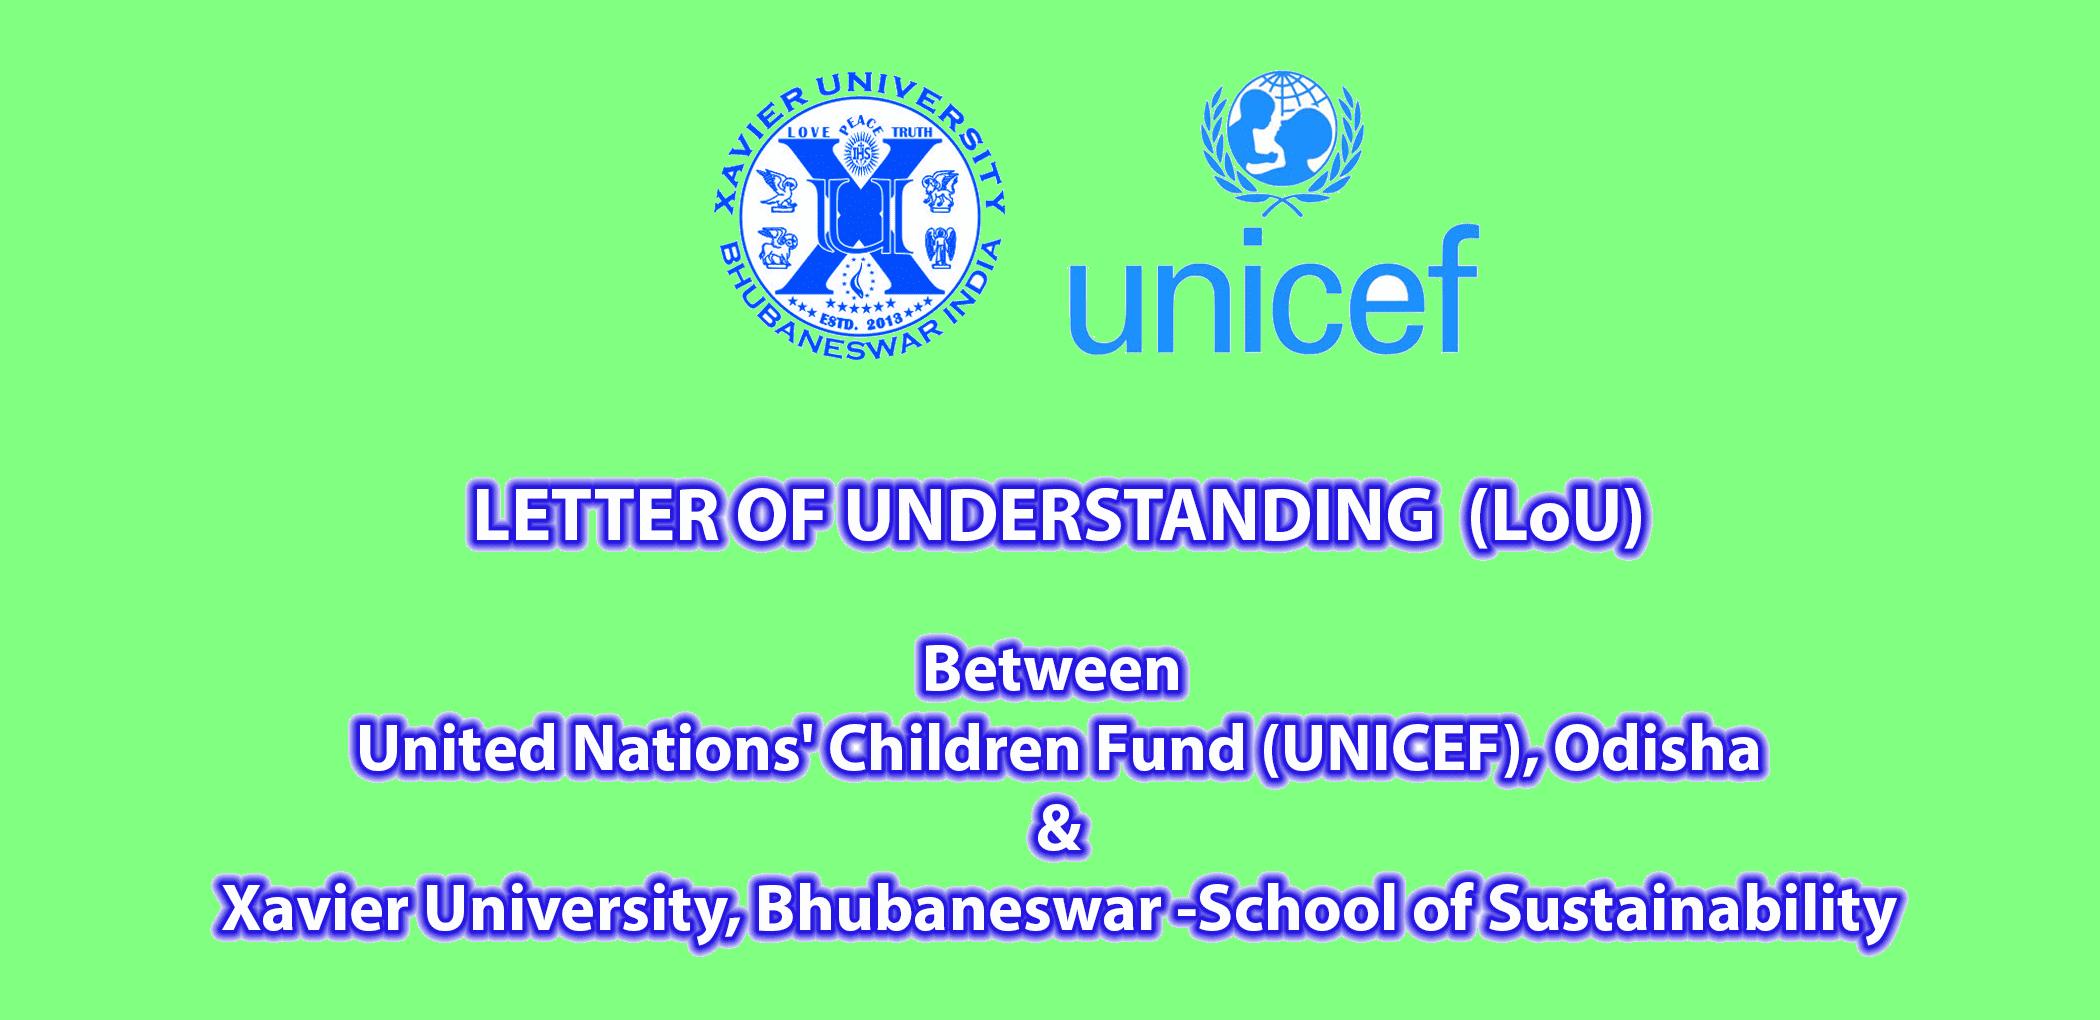 Letter of Understanding (LOU)